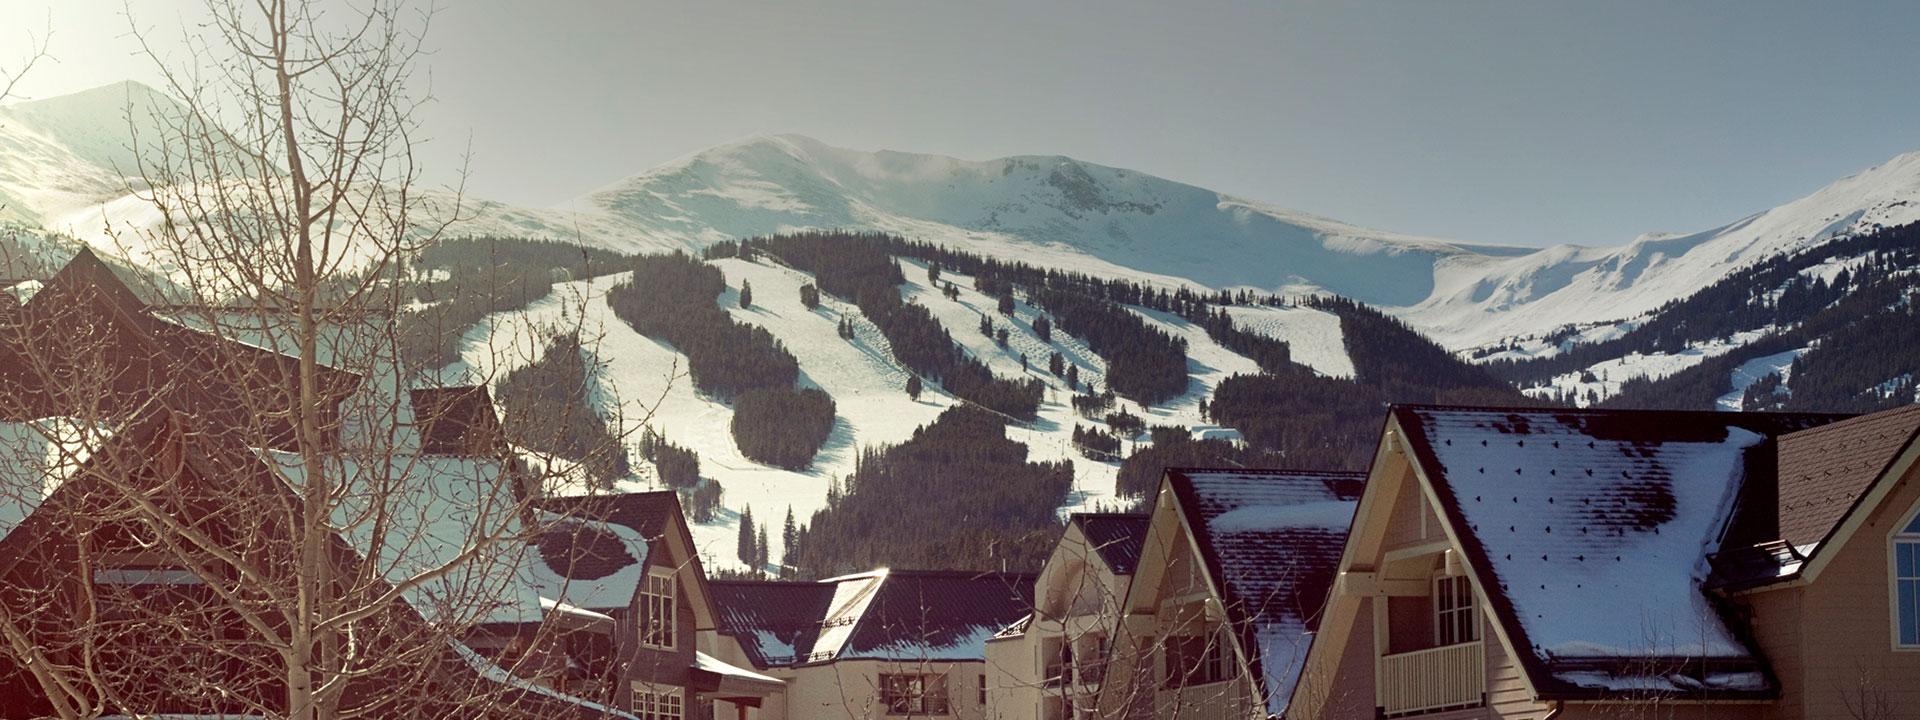 Photo of Breckenridge, in Summit County, Colorado